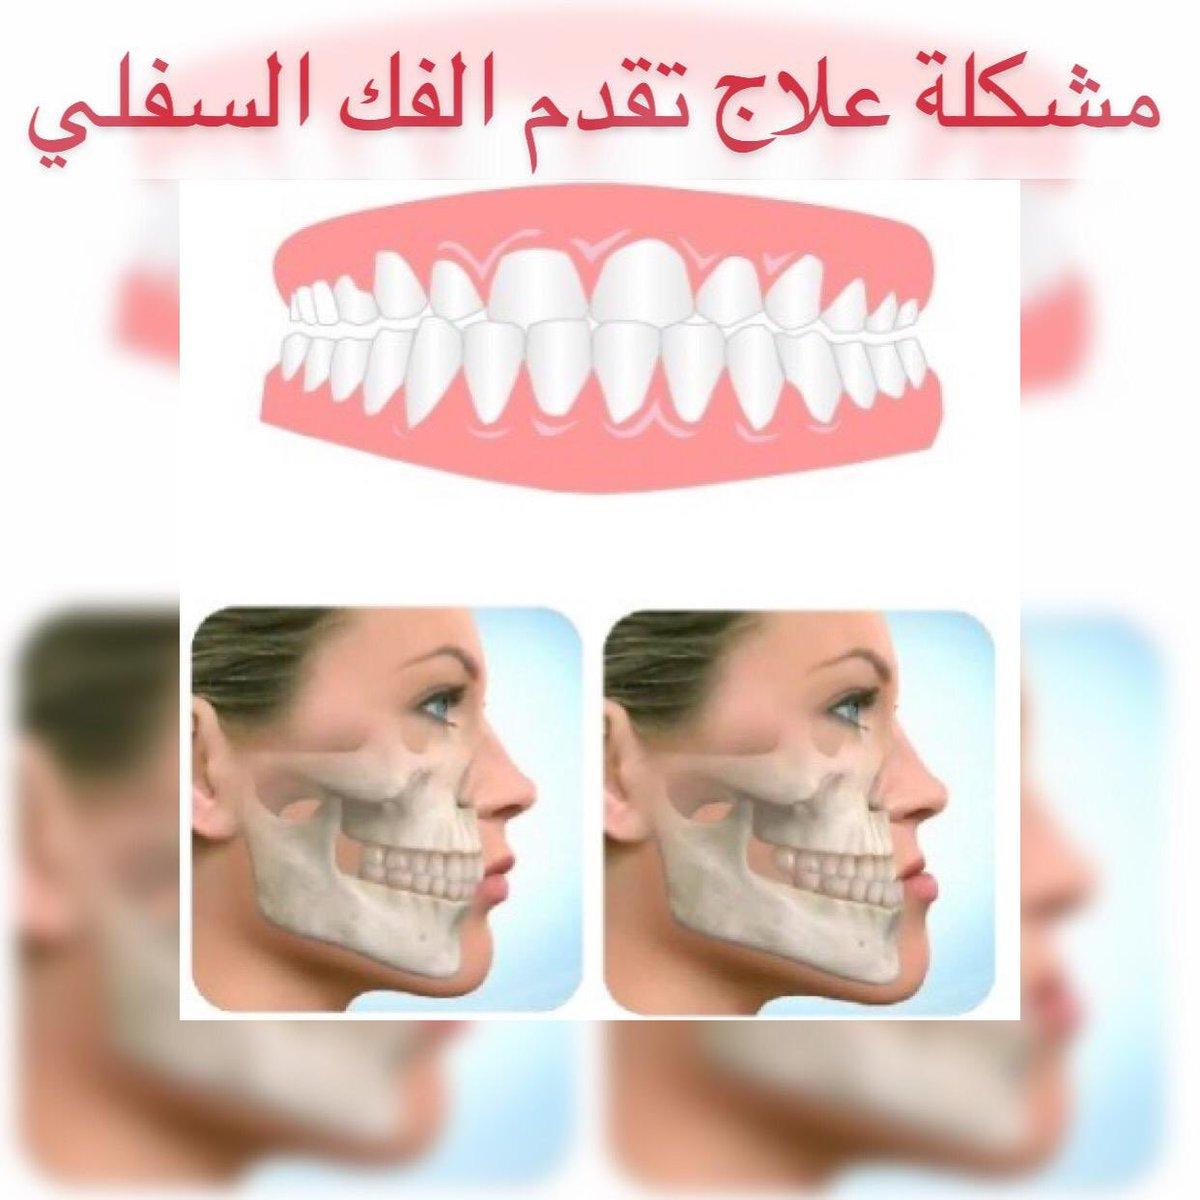 Dr Anas Alomari On Twitter علاج تقدم الفك السفلي كل يوم معلومة تهمك حول تقويم الأسنان تابعنا على Https T Co Lxn3xjeuon